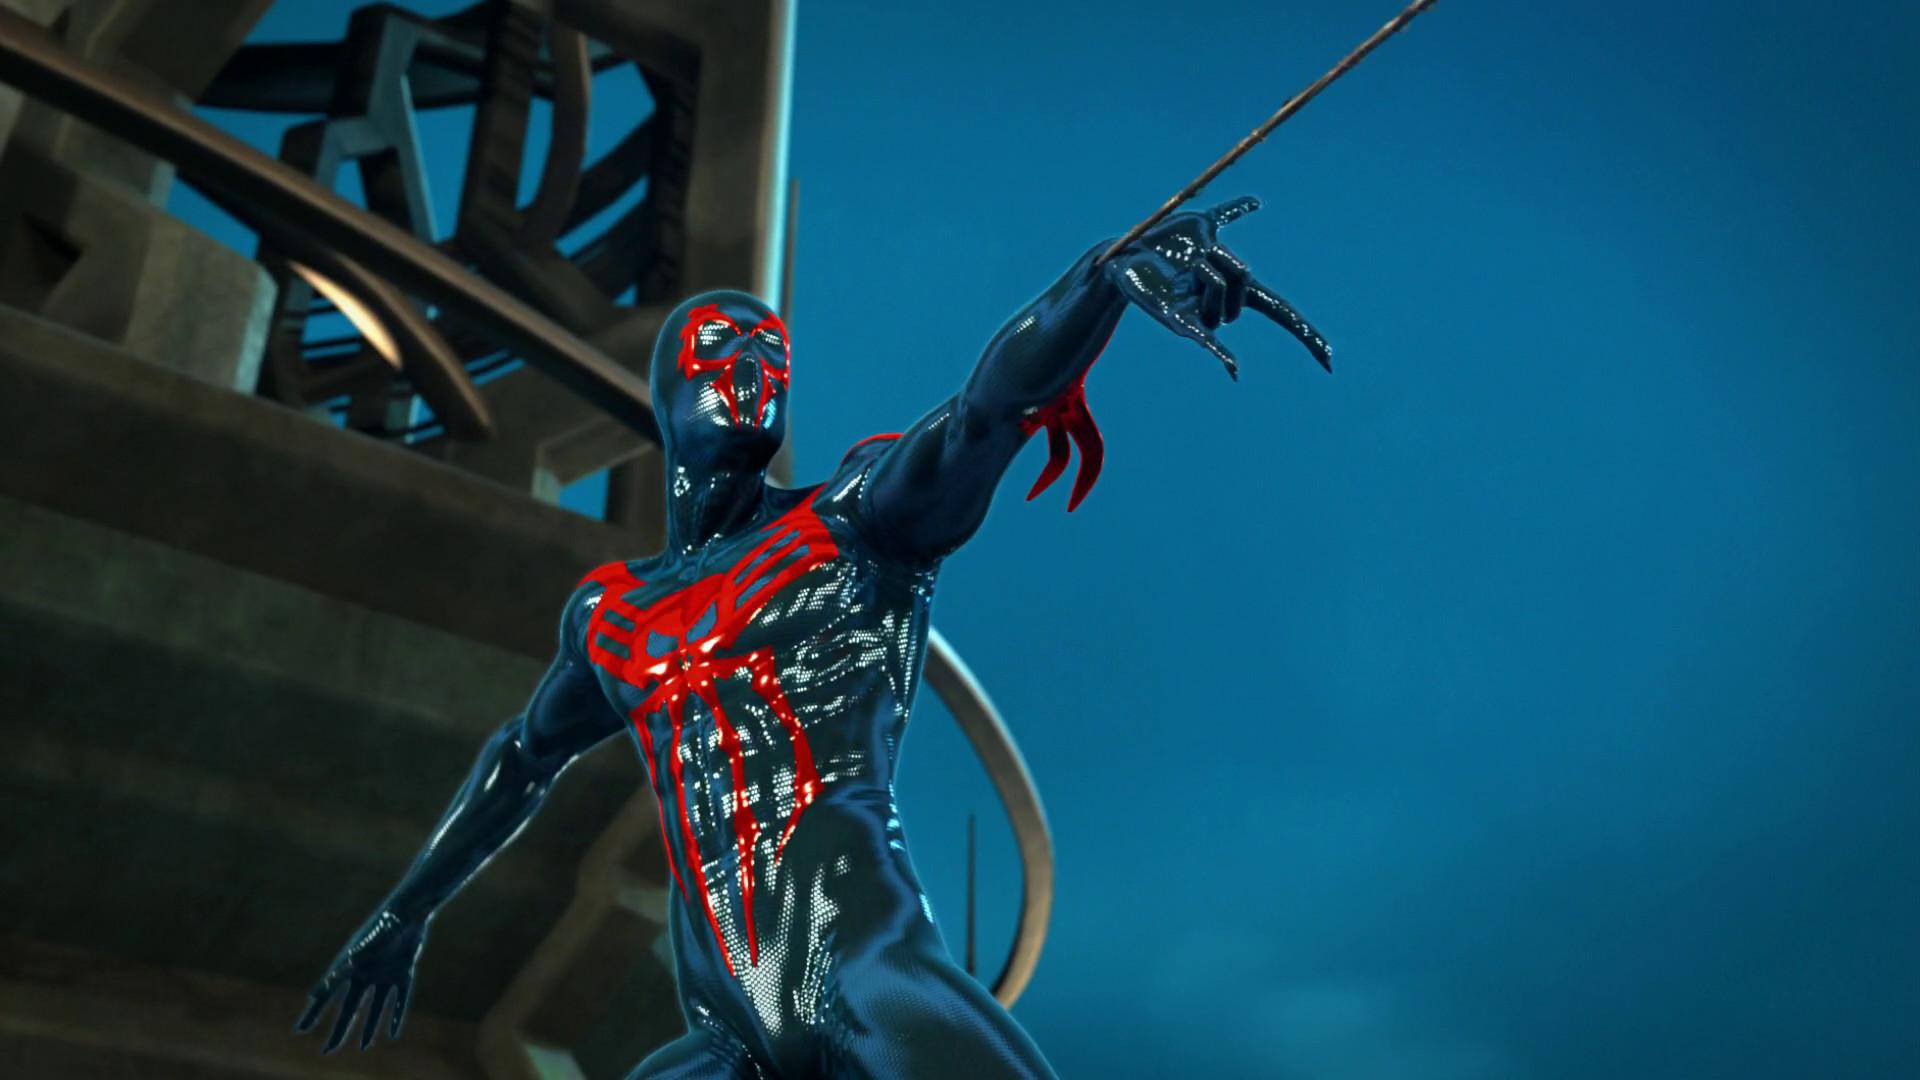 Spider Man 2099 Wallpaper On Wallpaperget Com: Spider Man 2099 Wallpaper (78+ Images